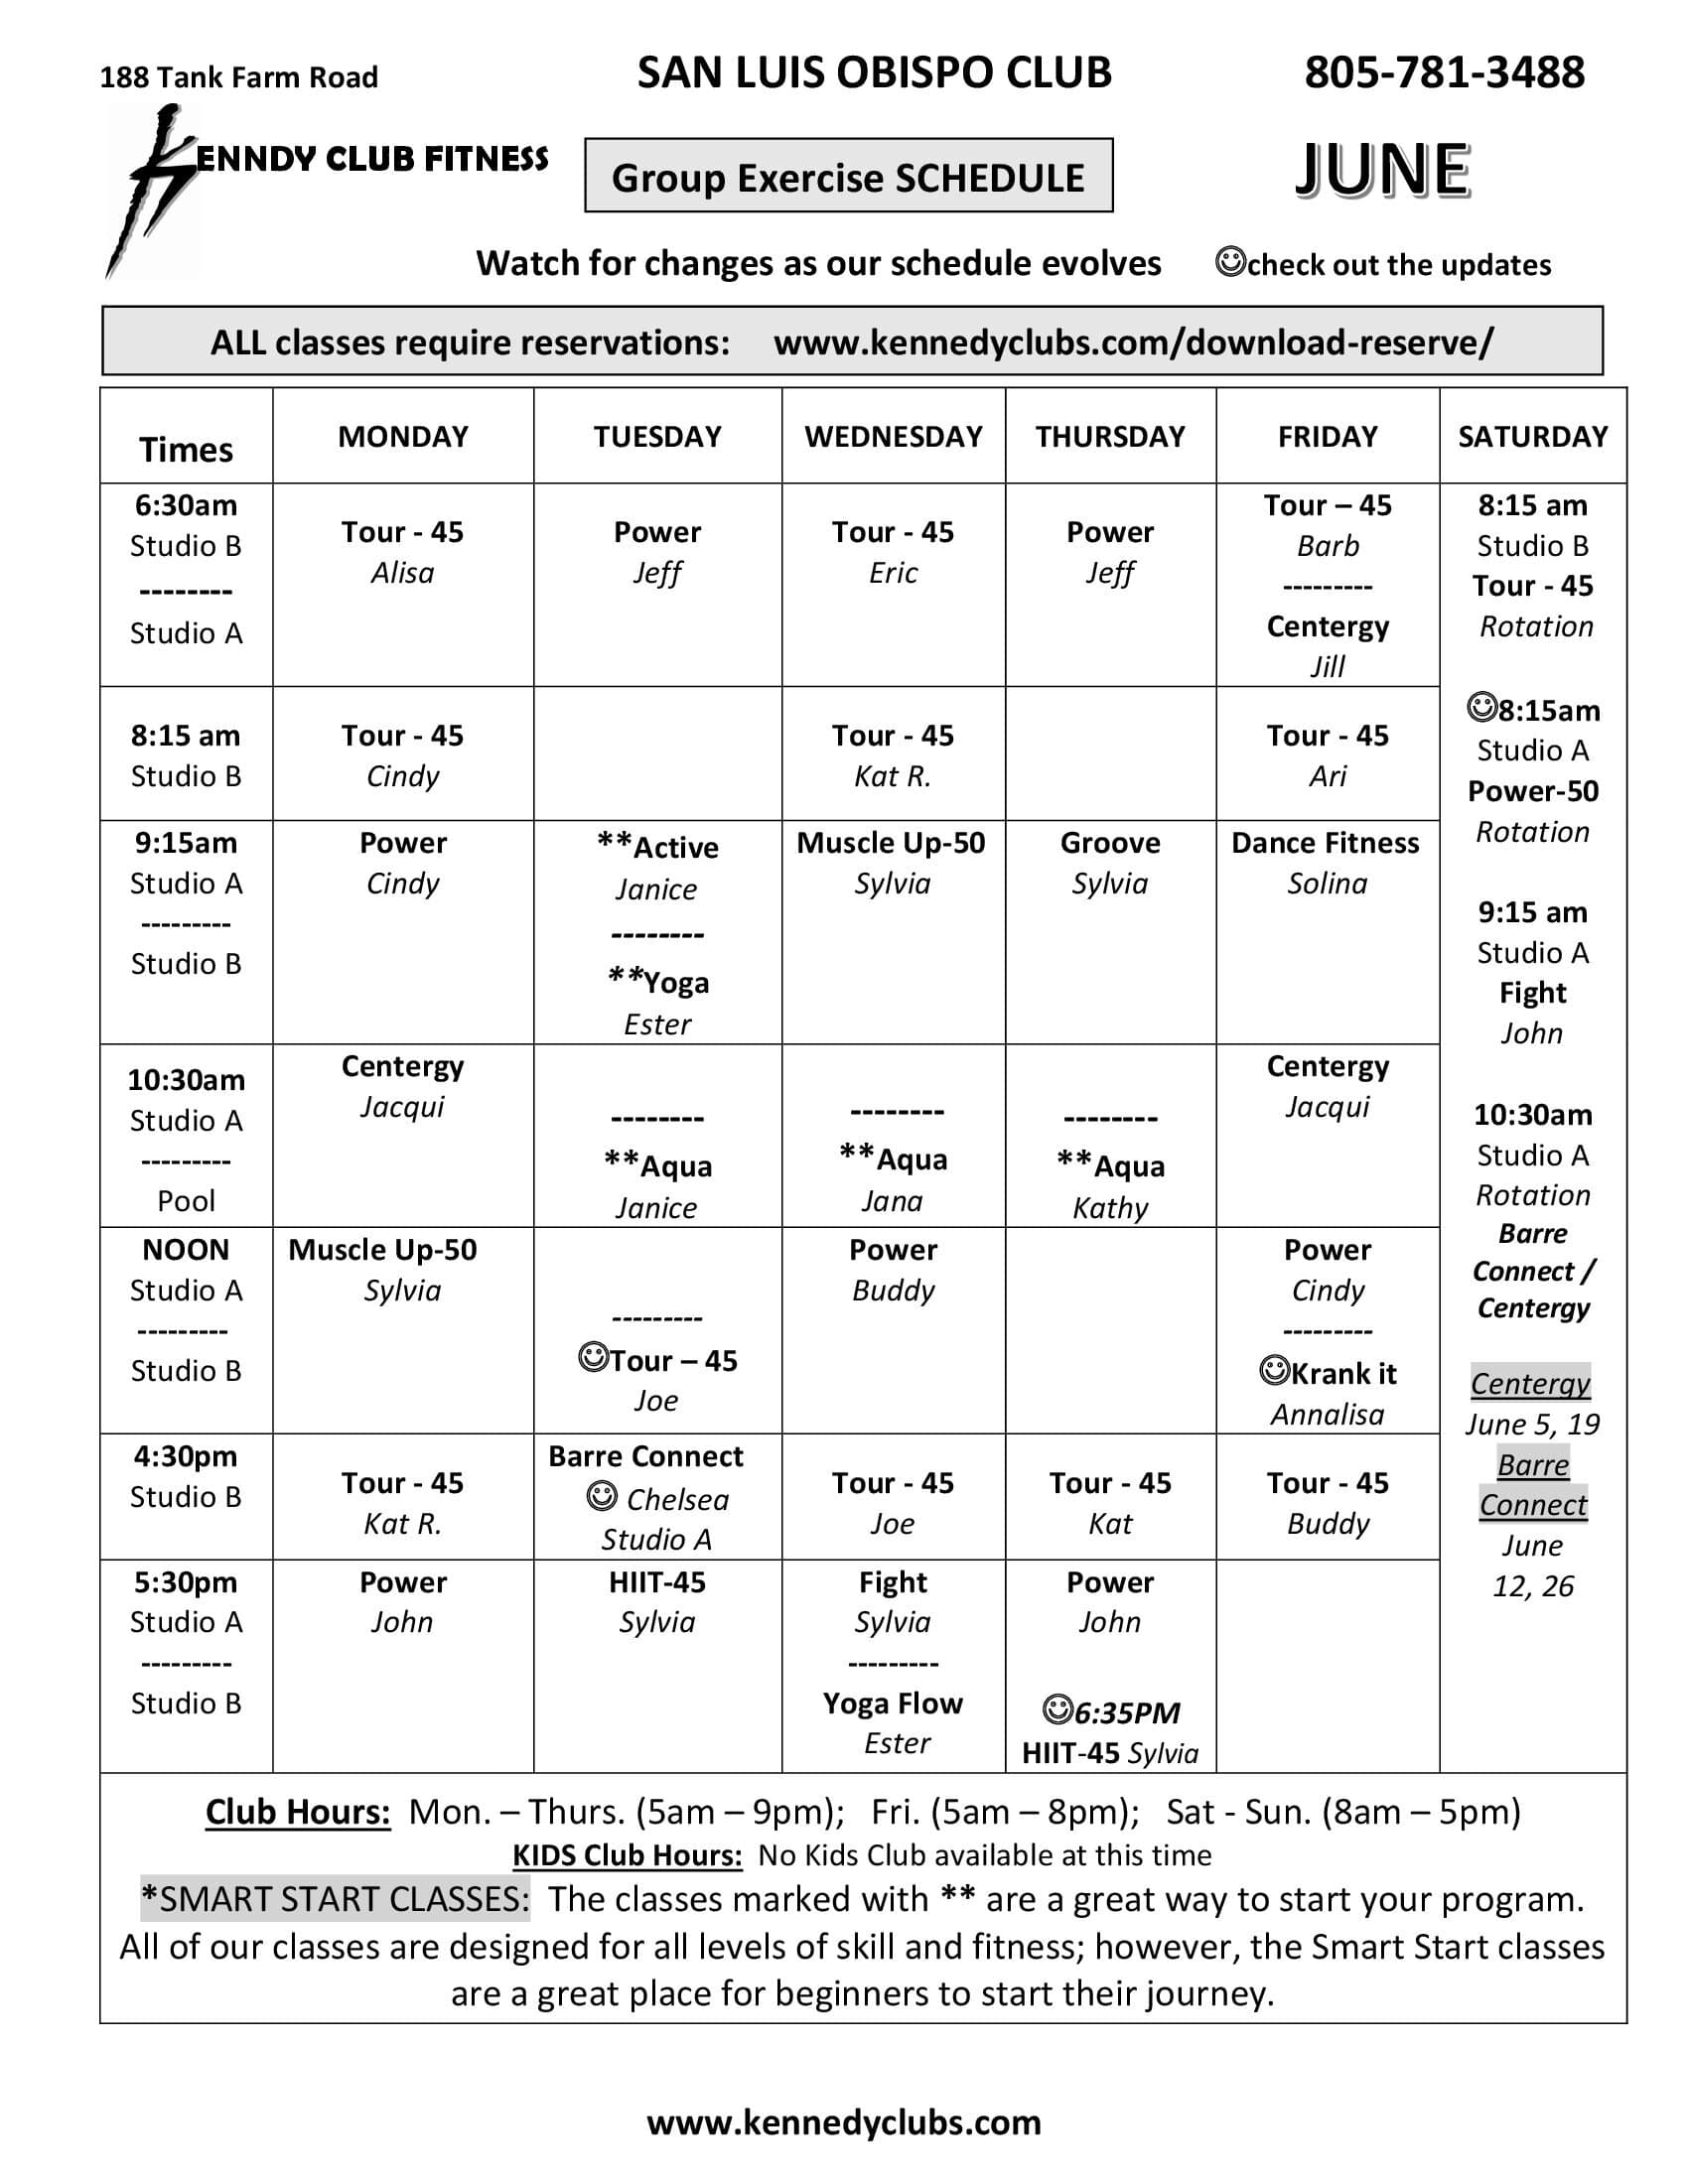 Kennedy Club Fitness San Luis Obispo Group Exercise Schedule 06 26 2021